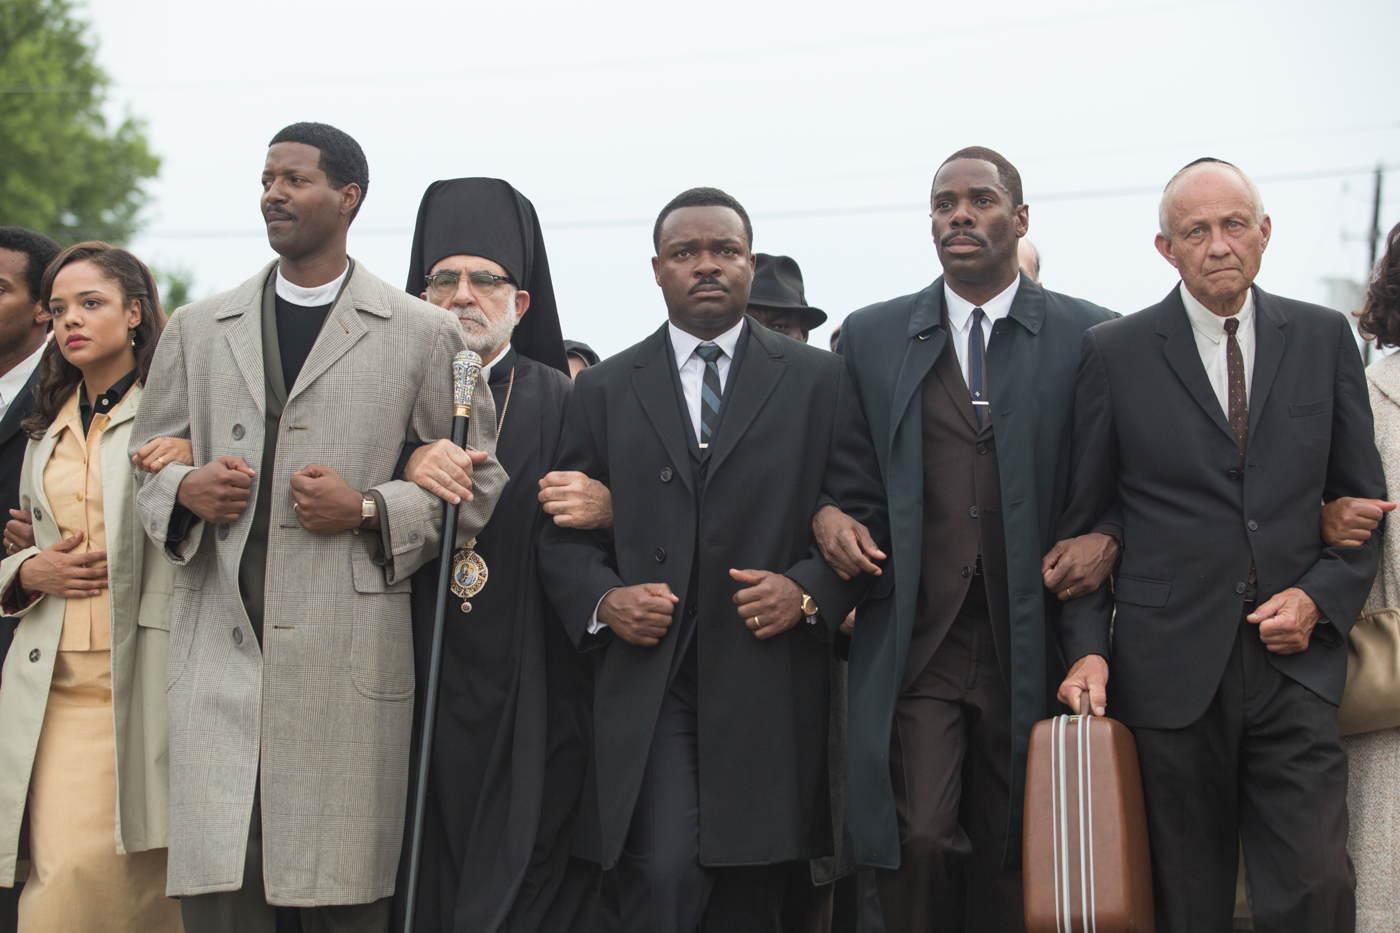 Selma (Film)